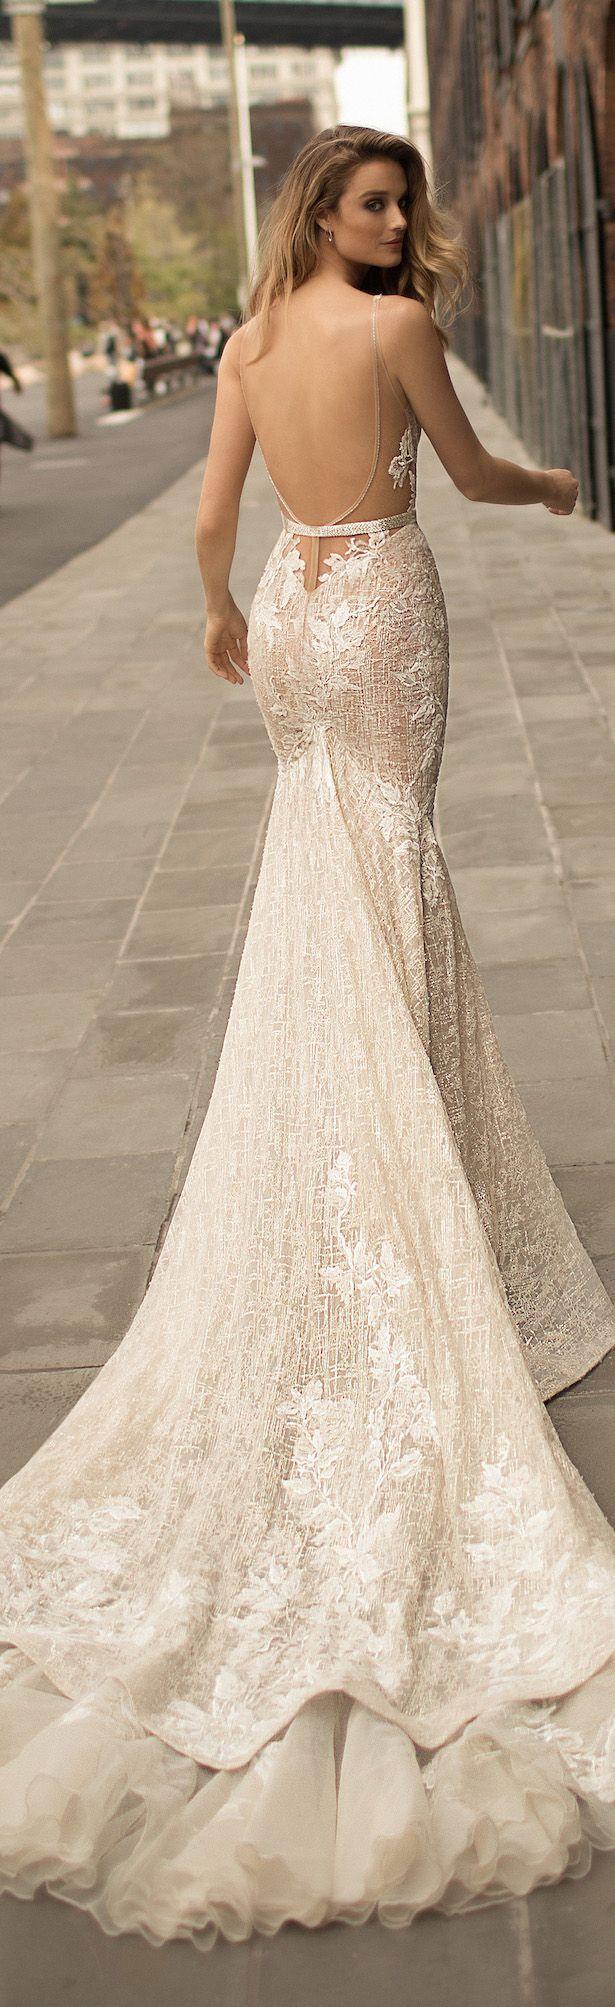 24180 best Wedding Dress images on Pinterest | Wedding dress, Bridal ...